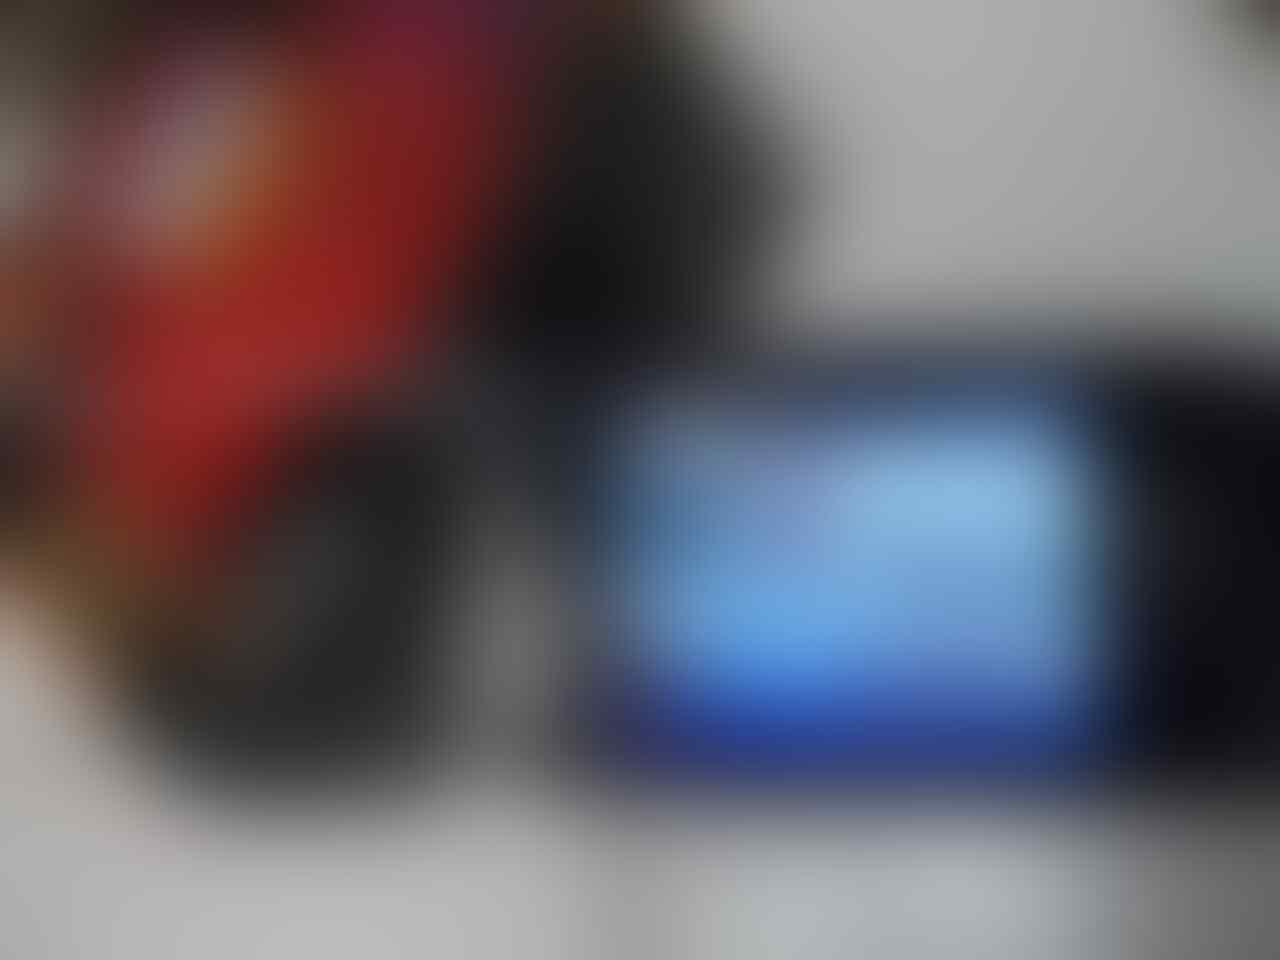 Ponsel TV Maxtron MG321